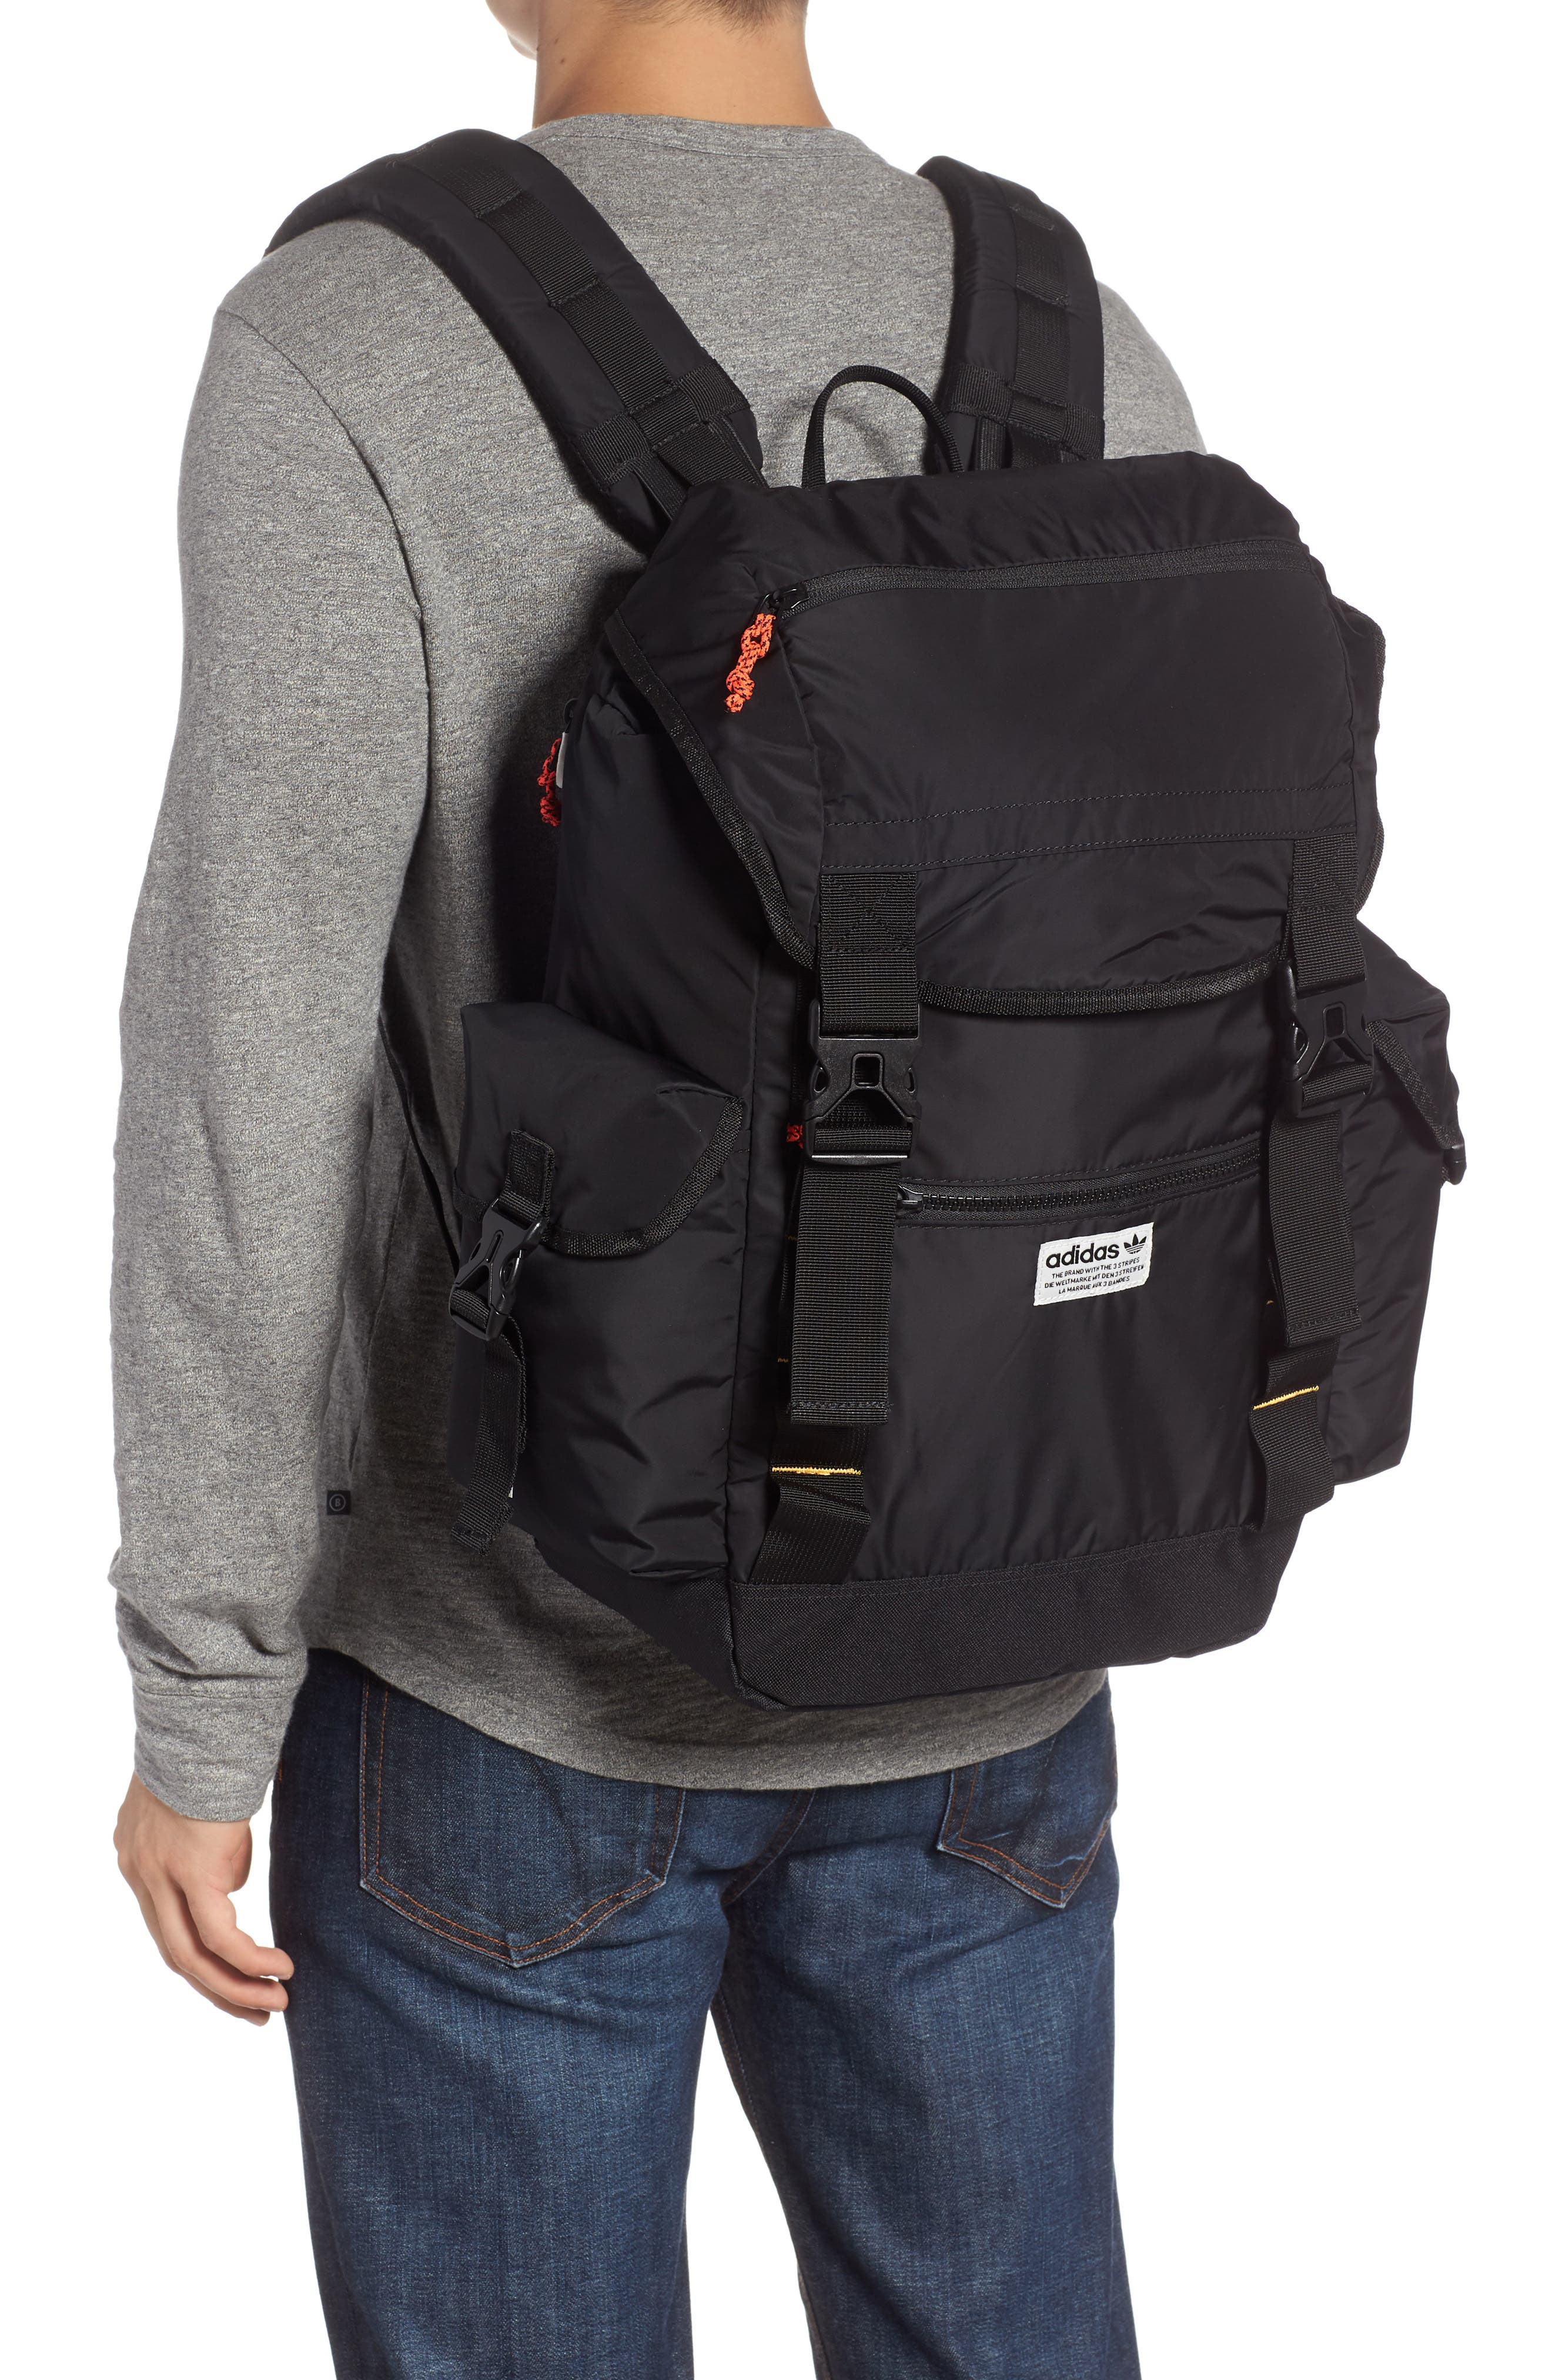 Urban Utility Backpack,                             Alternate thumbnail 2, color,                             001